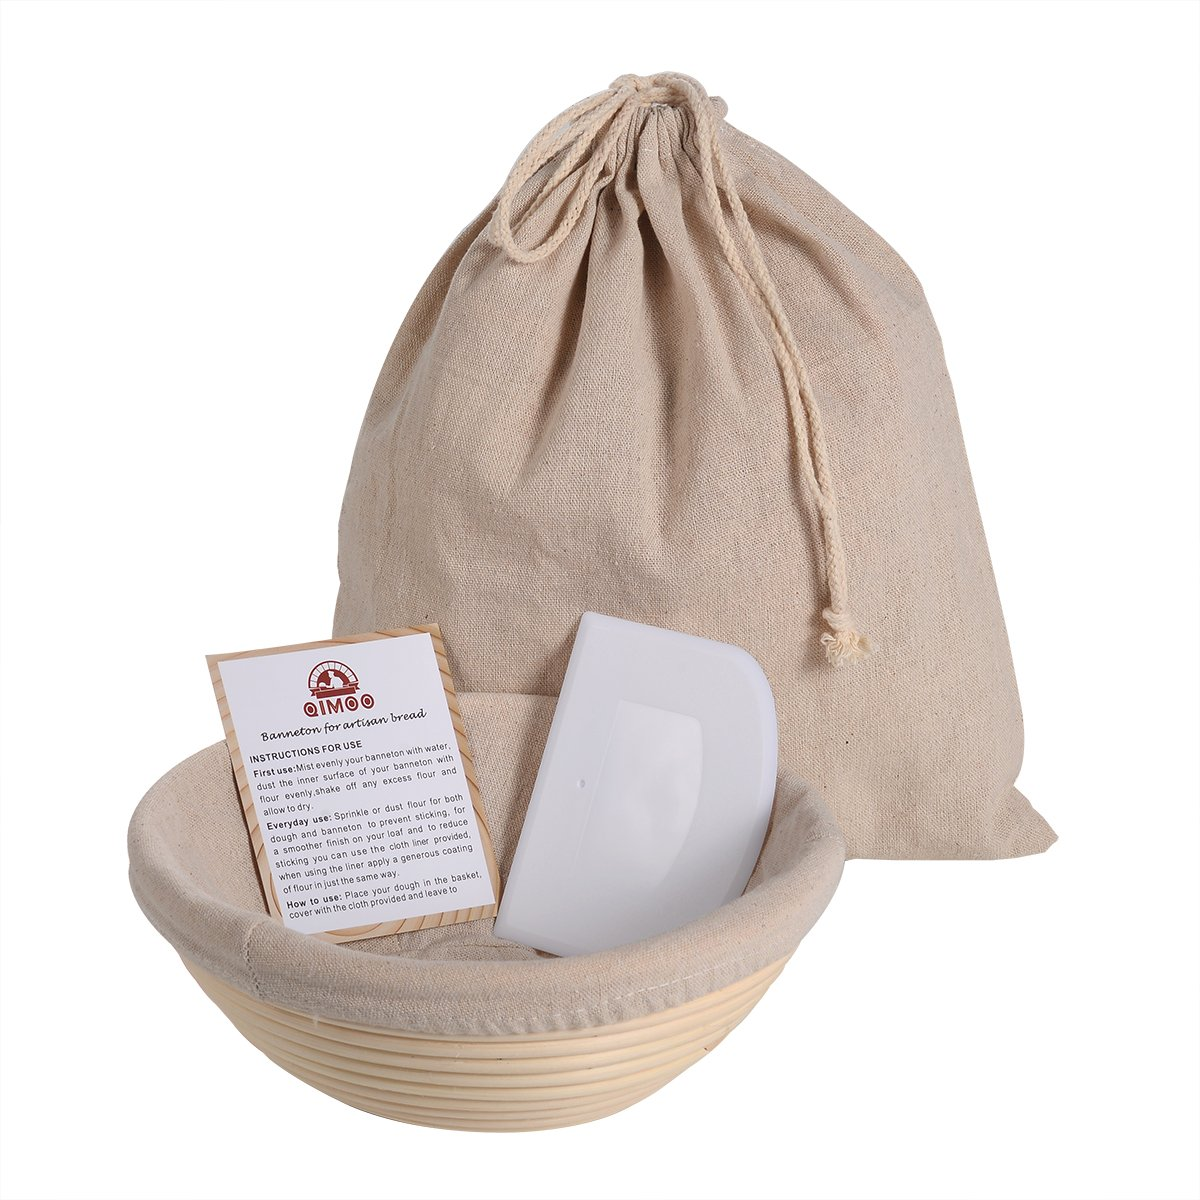 Round 8.5 inch Banneton Proofing Basket Baking Set (500g Dough) for Rising Sourdough Bread with Bowl Scraper & Brotform cloth Liner & Artisan Bread Loaf Bag